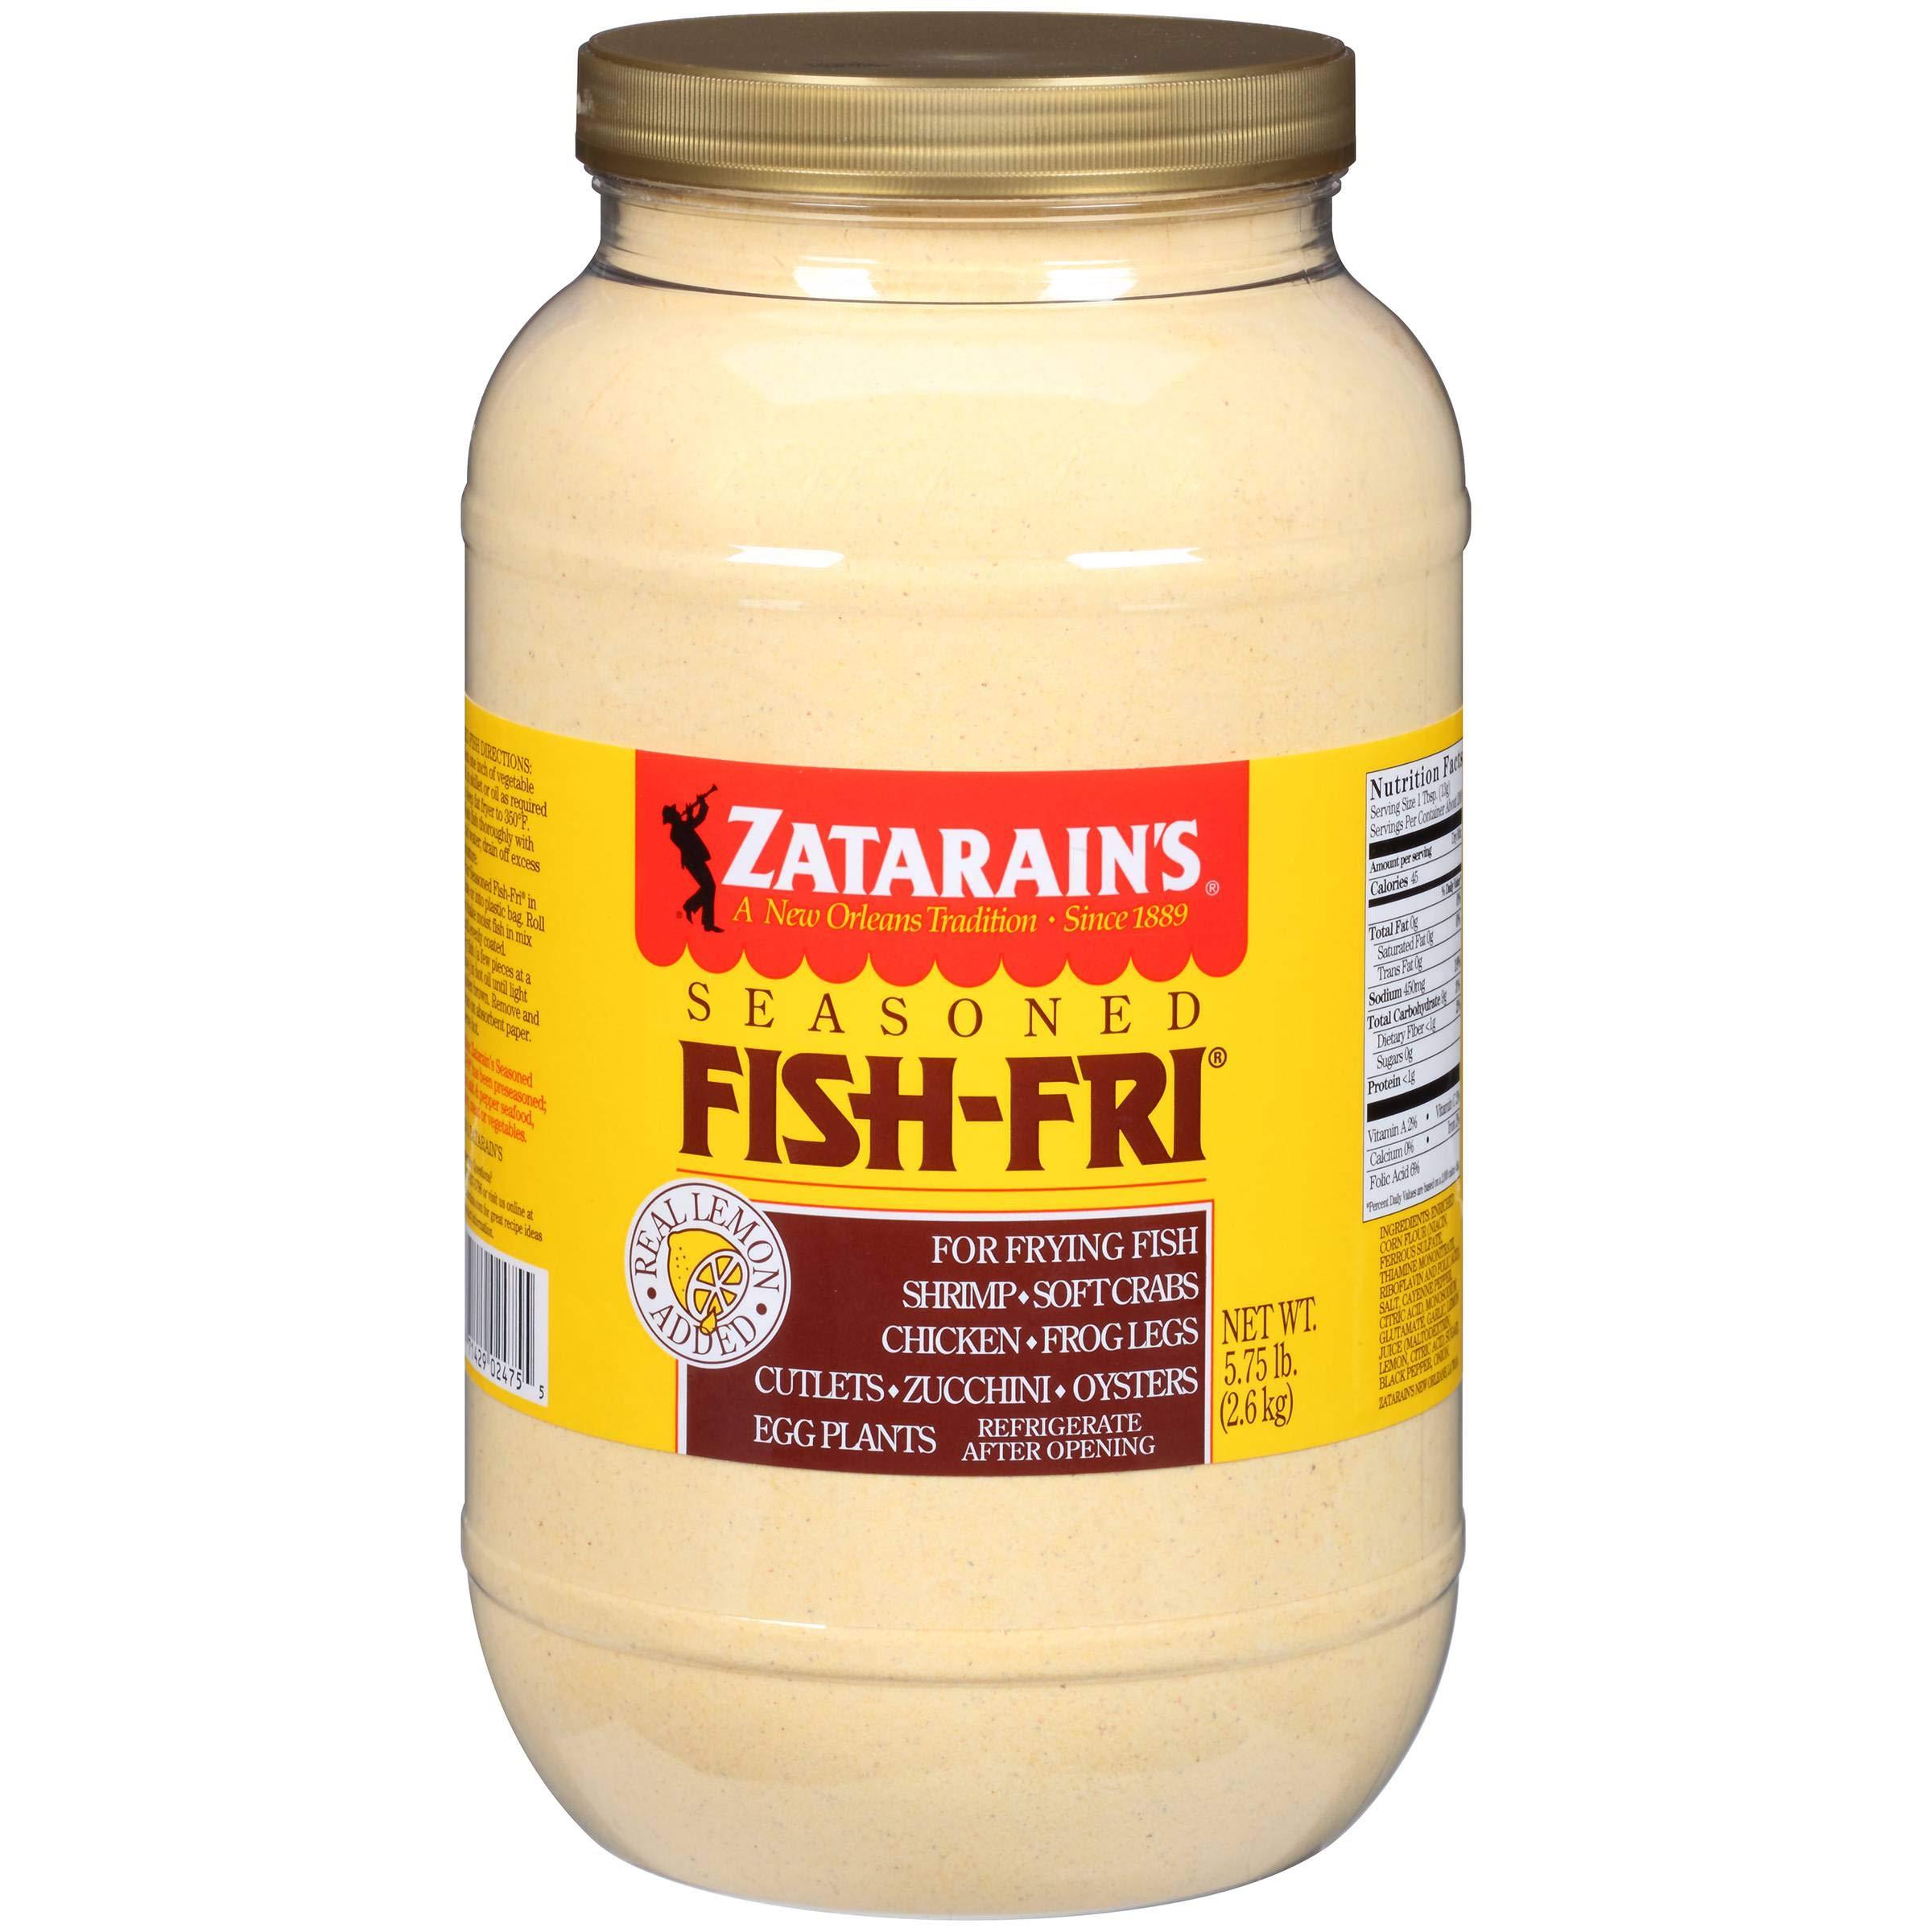 Zatarains Breading Seasoned Fish Fry, 5.75 Pound -- 4 per case.